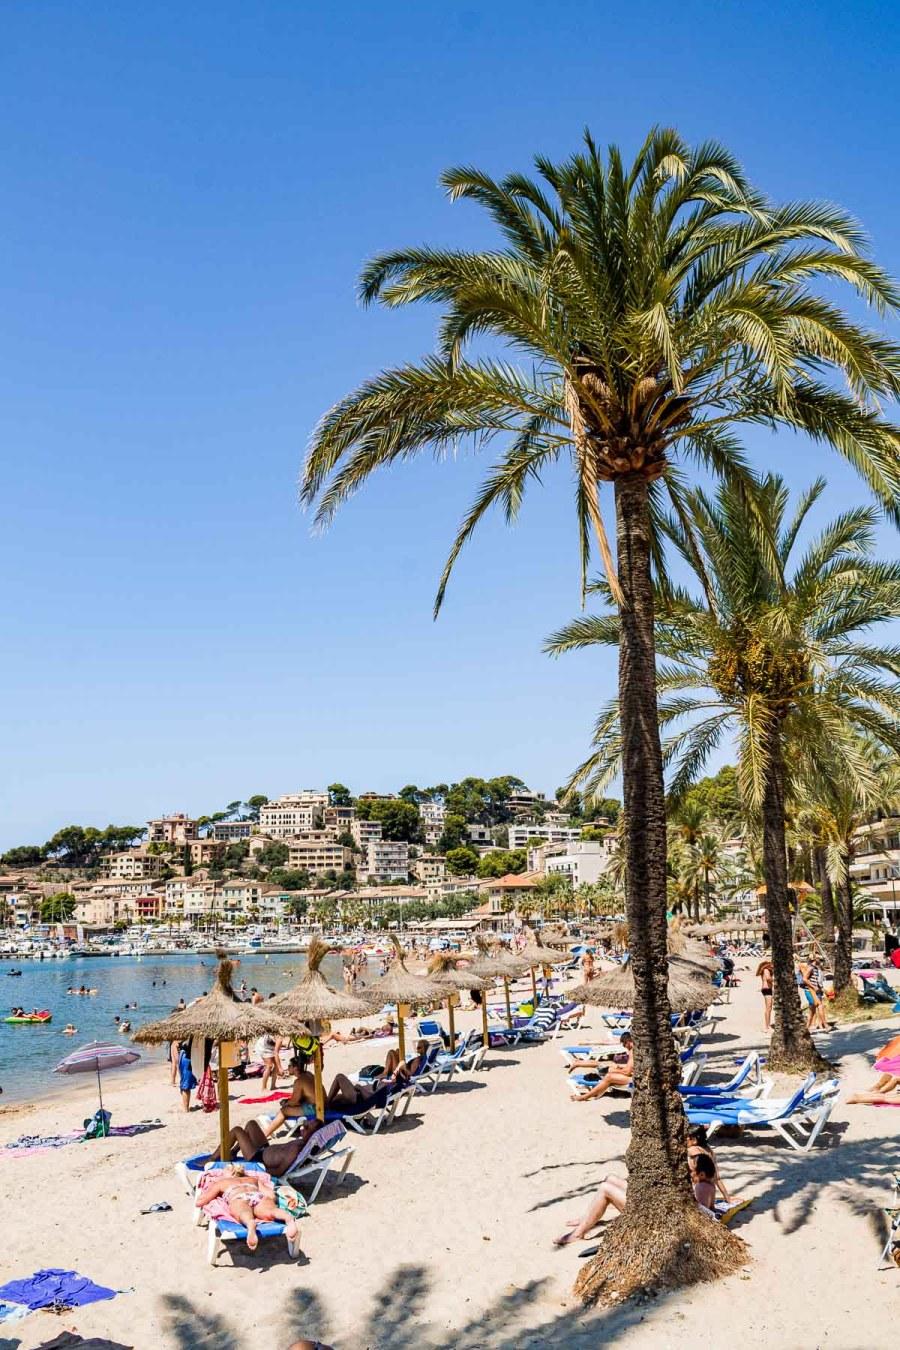 White sandy beach at Port de Soller in Mallorca